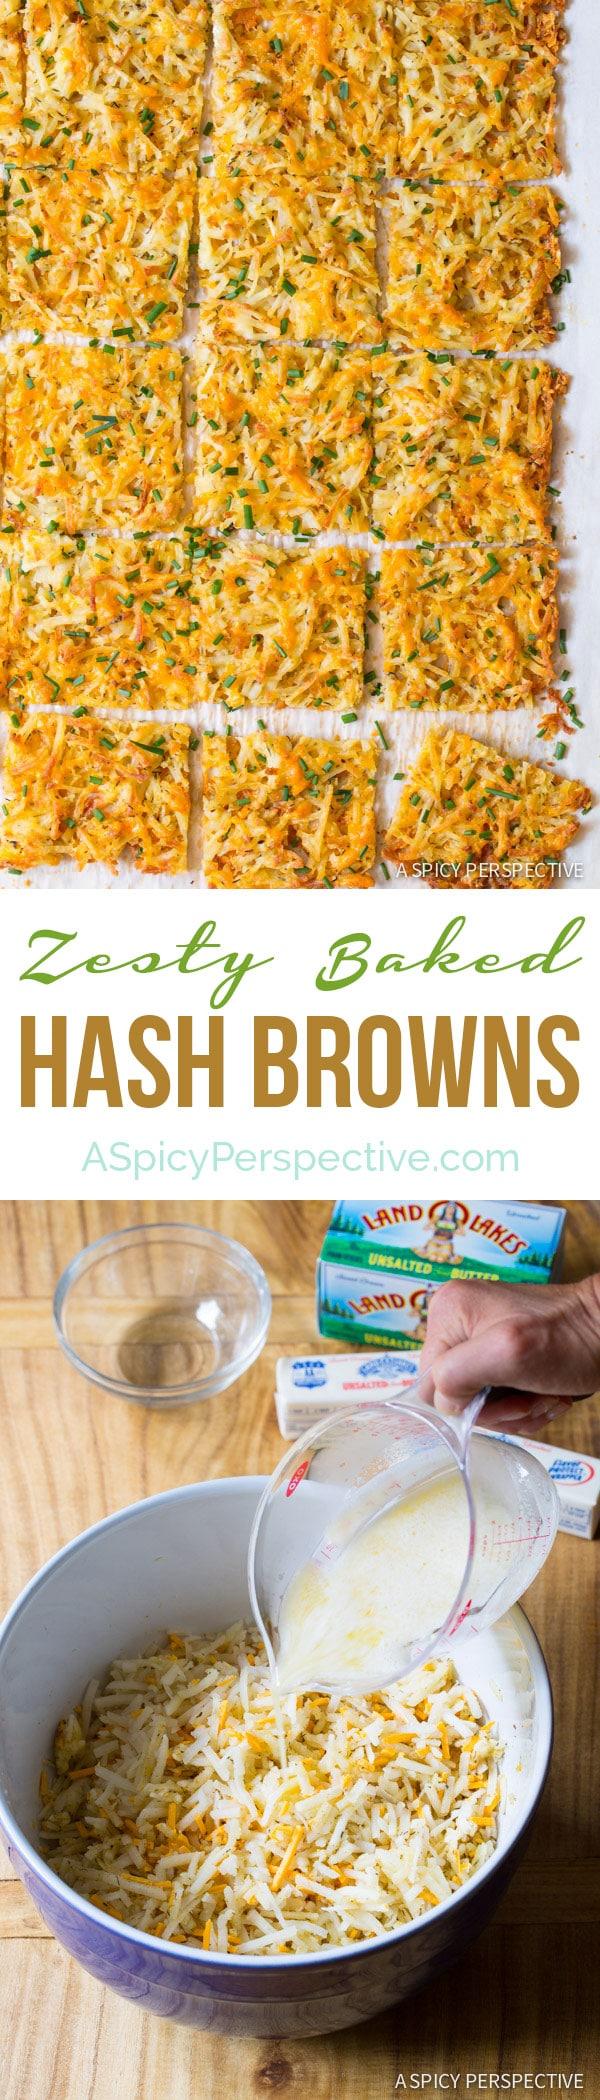 Zesty Herb Hash Browns